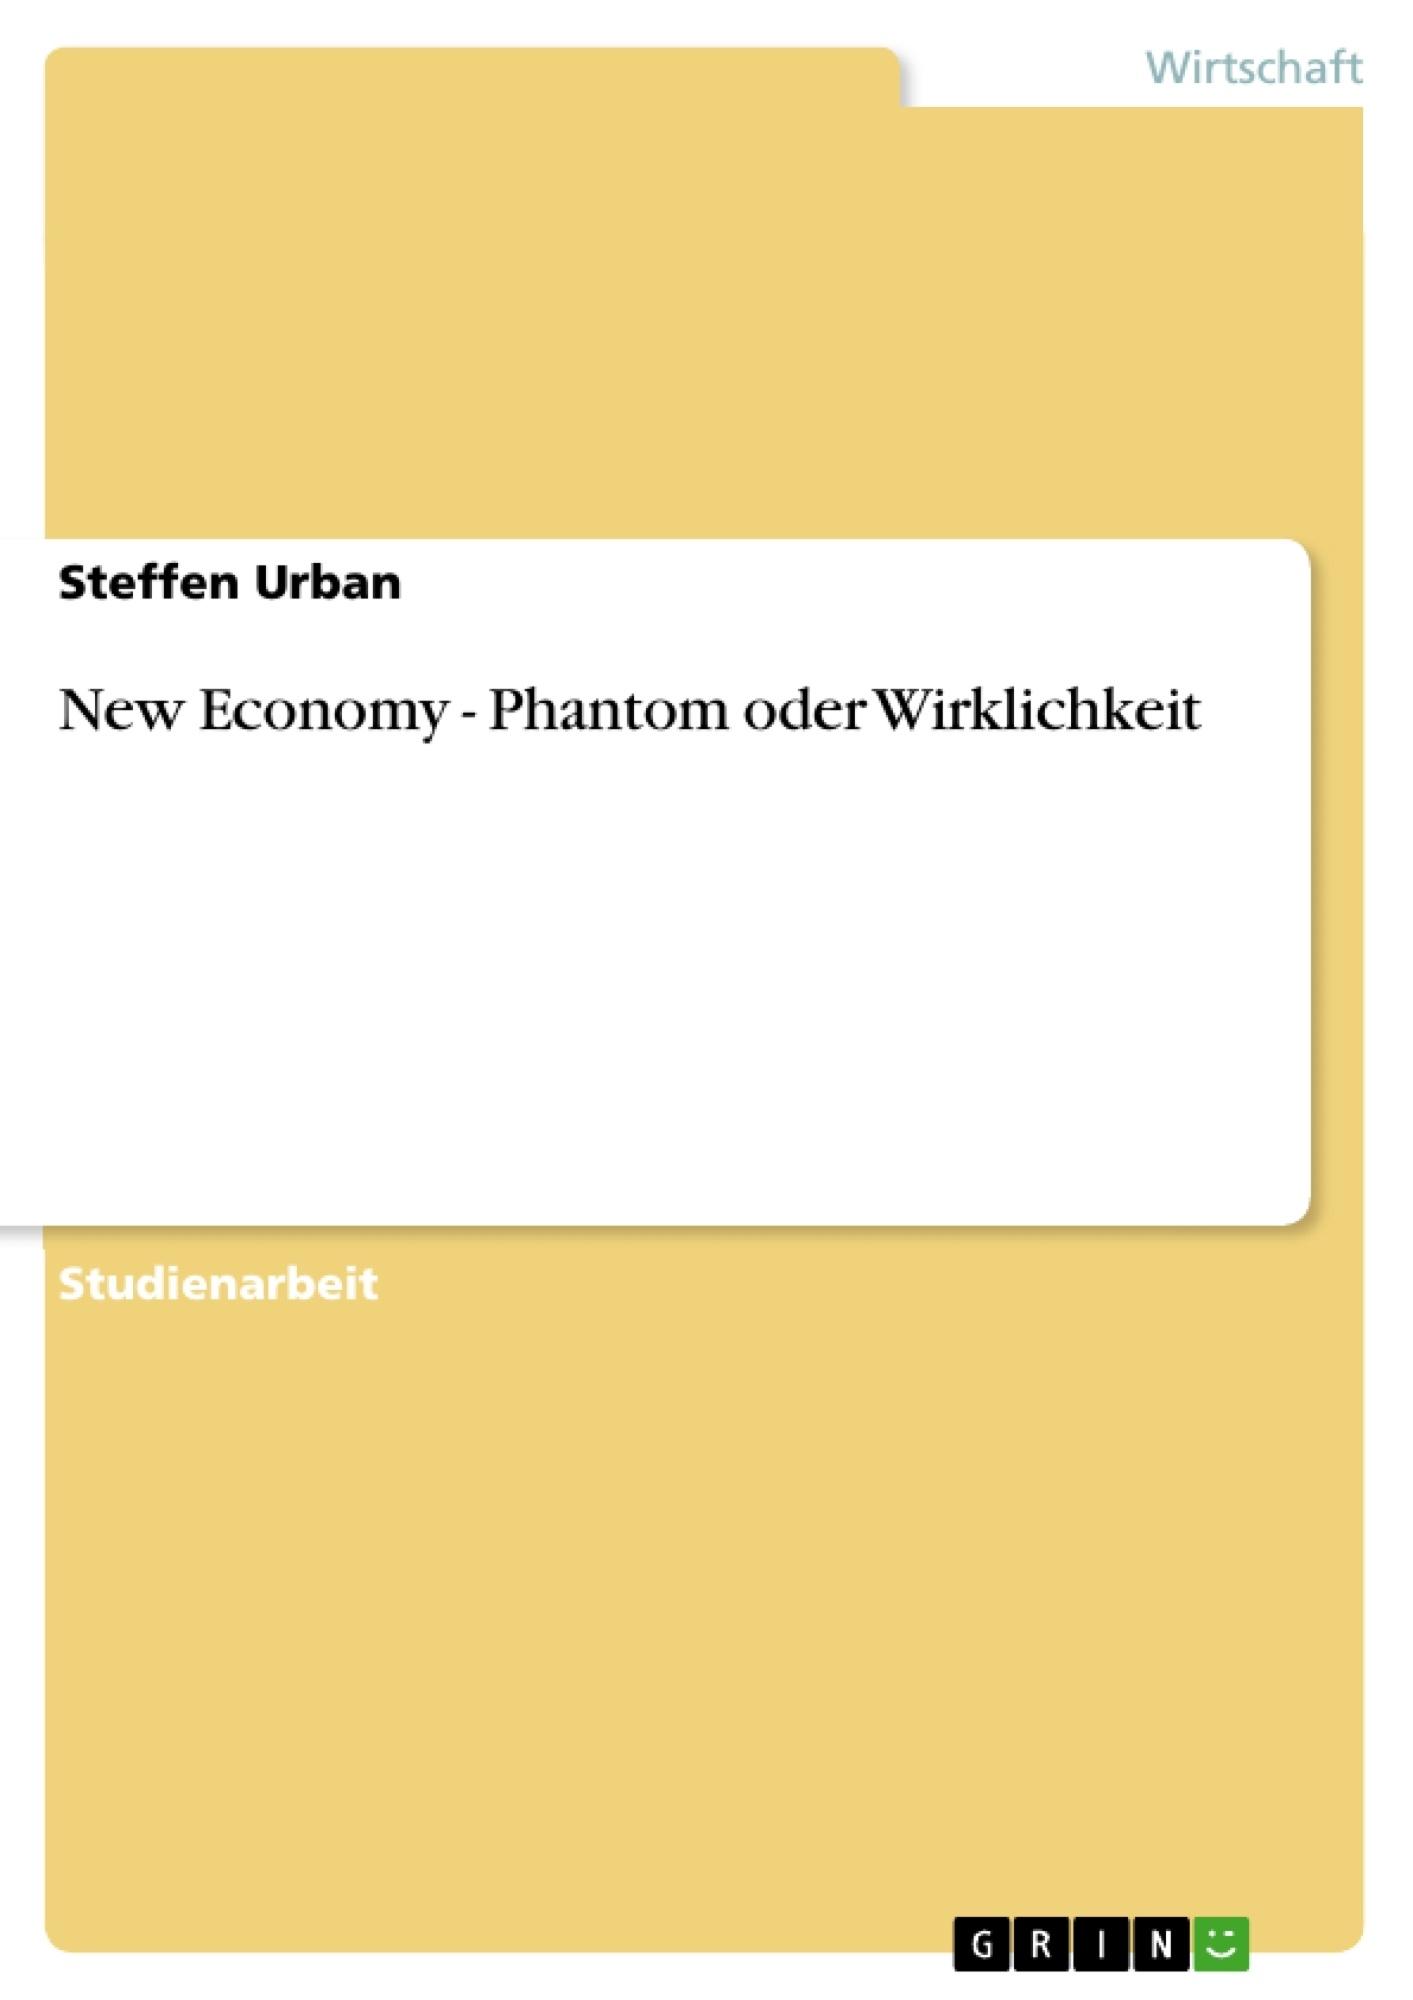 Titel: New Economy - Phantom oder Wirklichkeit